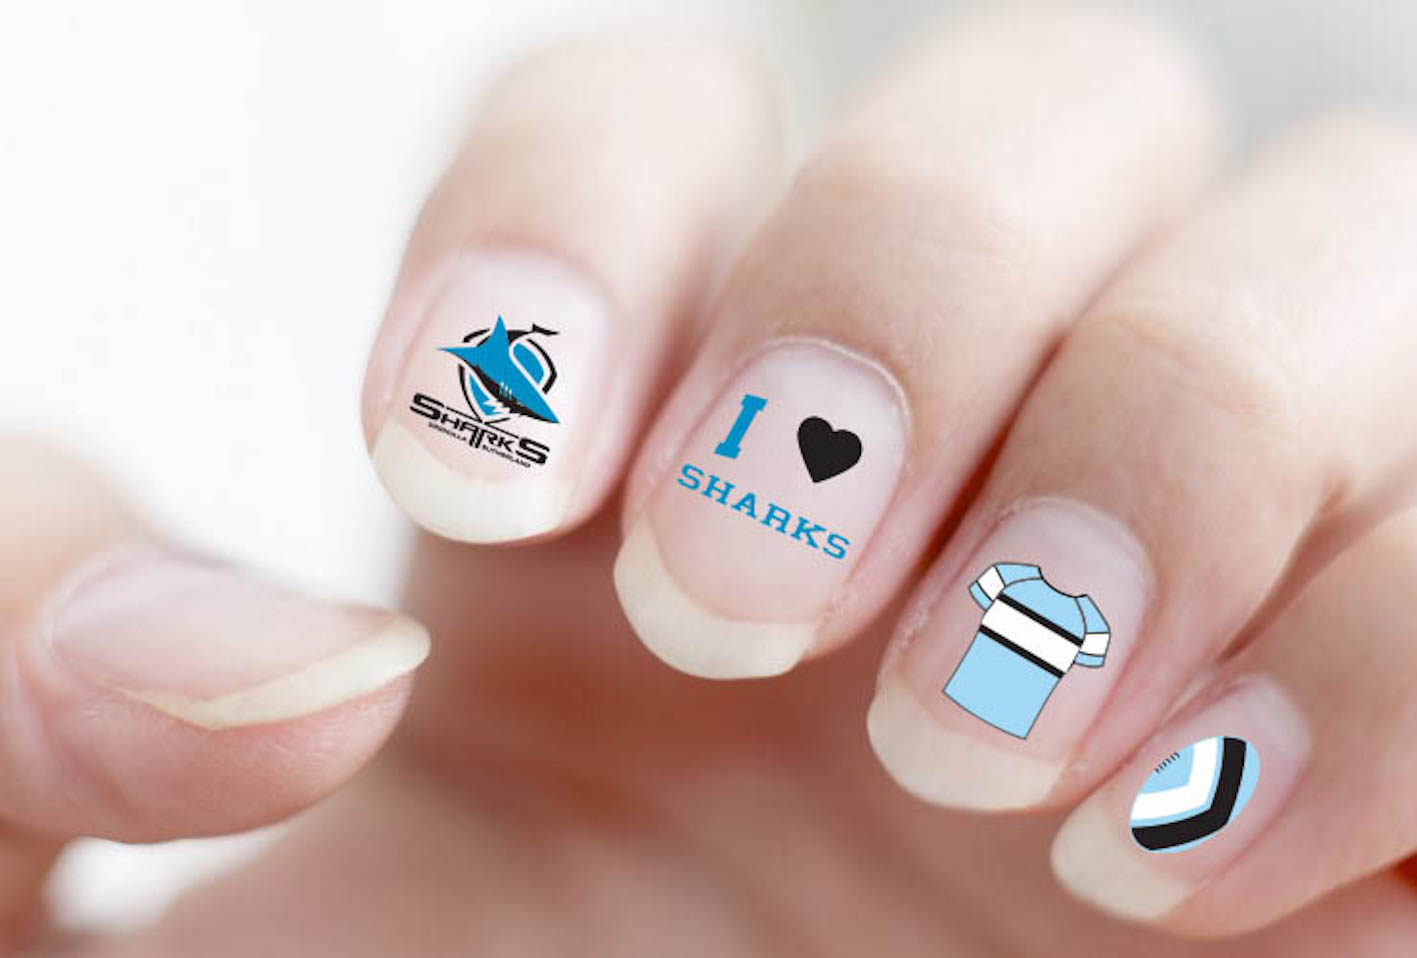 Cronulla Sharks NRL Nail Art Decal Stickers Gel or Polish ...